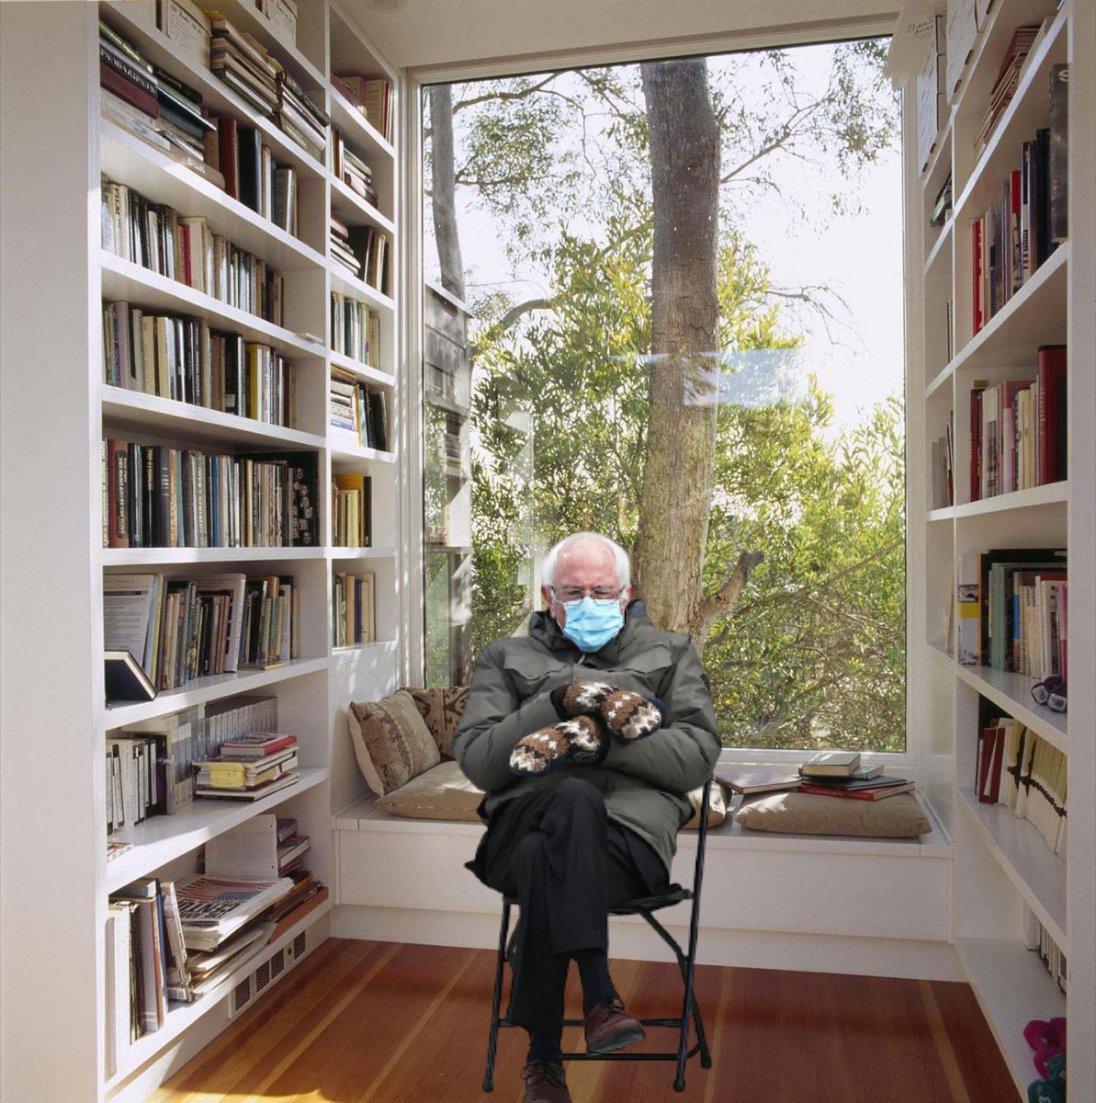 Bernie's favorite reading spot. Lol!  #Berniememes #reading #books